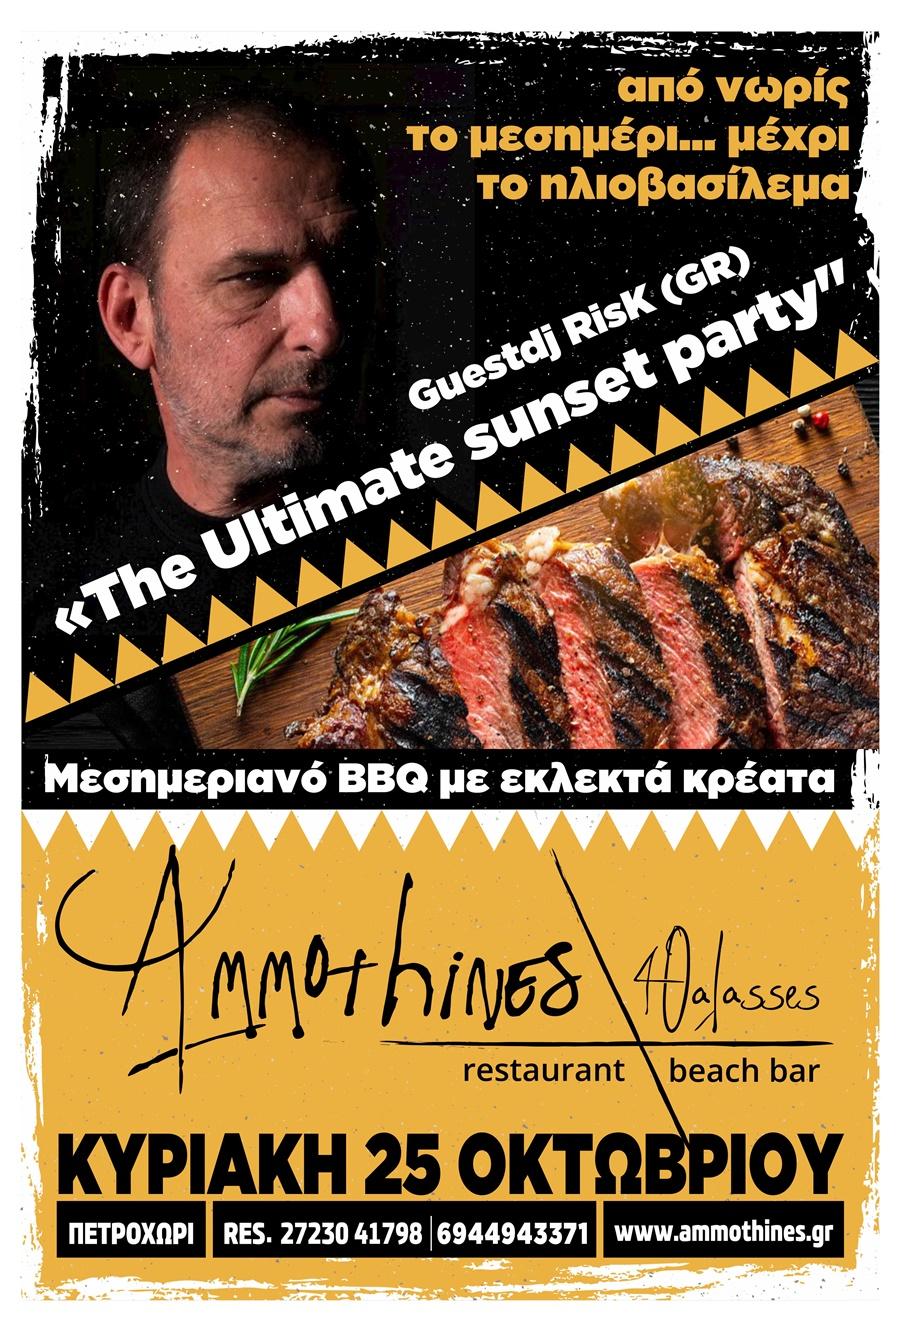 Ammothines restaurant για Κυριακάτικο BBQ και ιδανικό ηλιοβασίλεμα 22